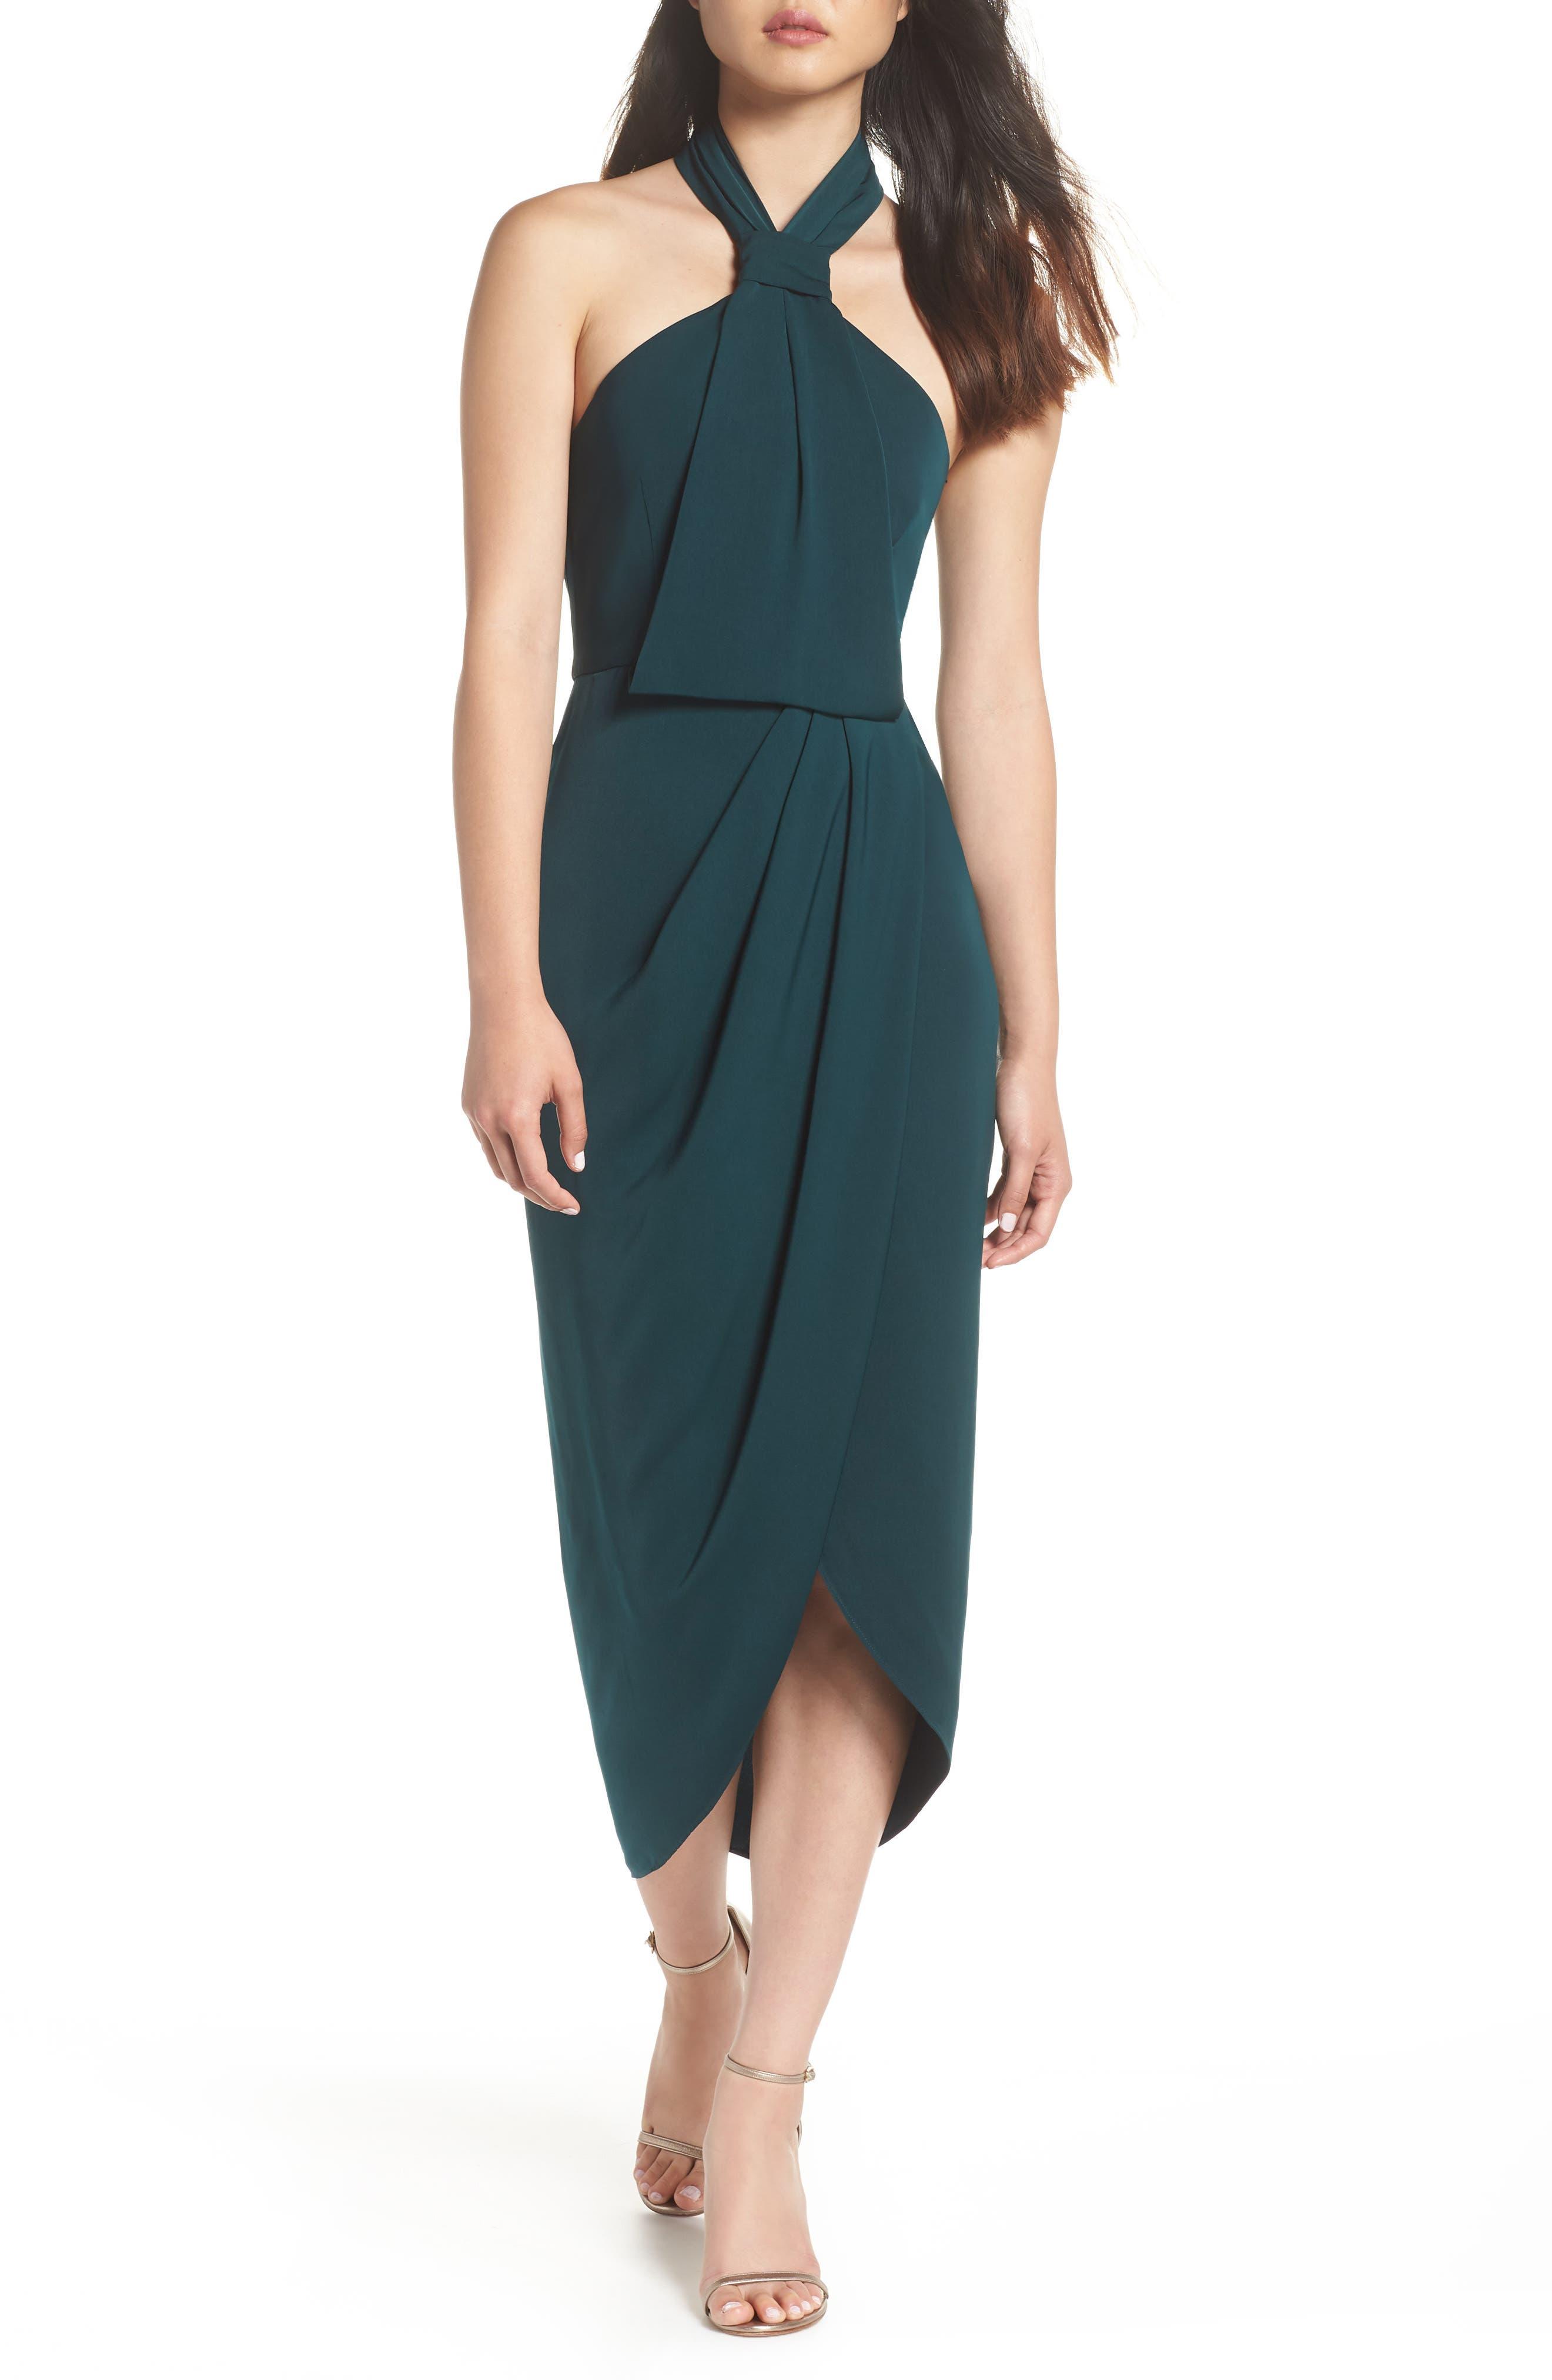 Shona Joy Knotted Tulip Hem Midi Dress, Green